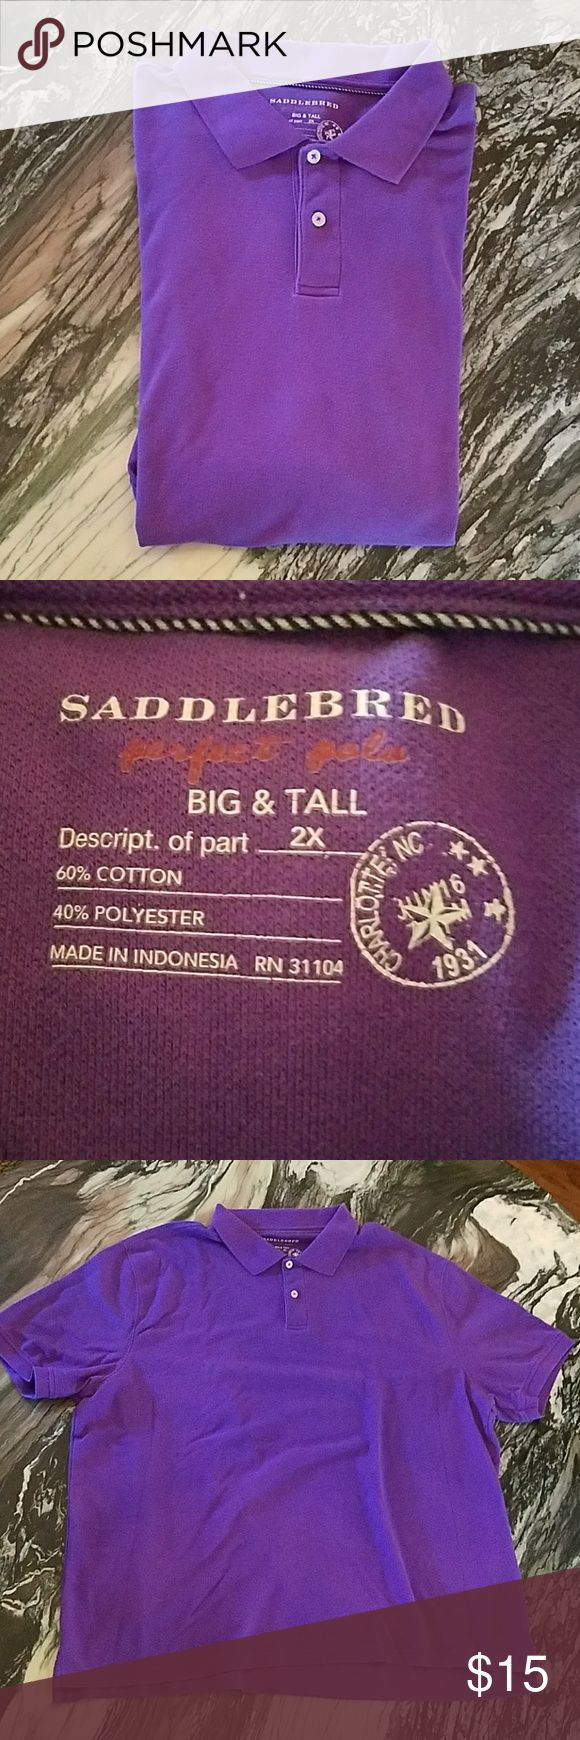 Saddlebred Big & Tall Polo Shirt Saddlebred Big & Tall Polo Shirt   Gorgoeus Purple!  Cotton and Polyester   Short sleeves   Cuffed sleeves   Split hem Saddlebred Shirts Polos